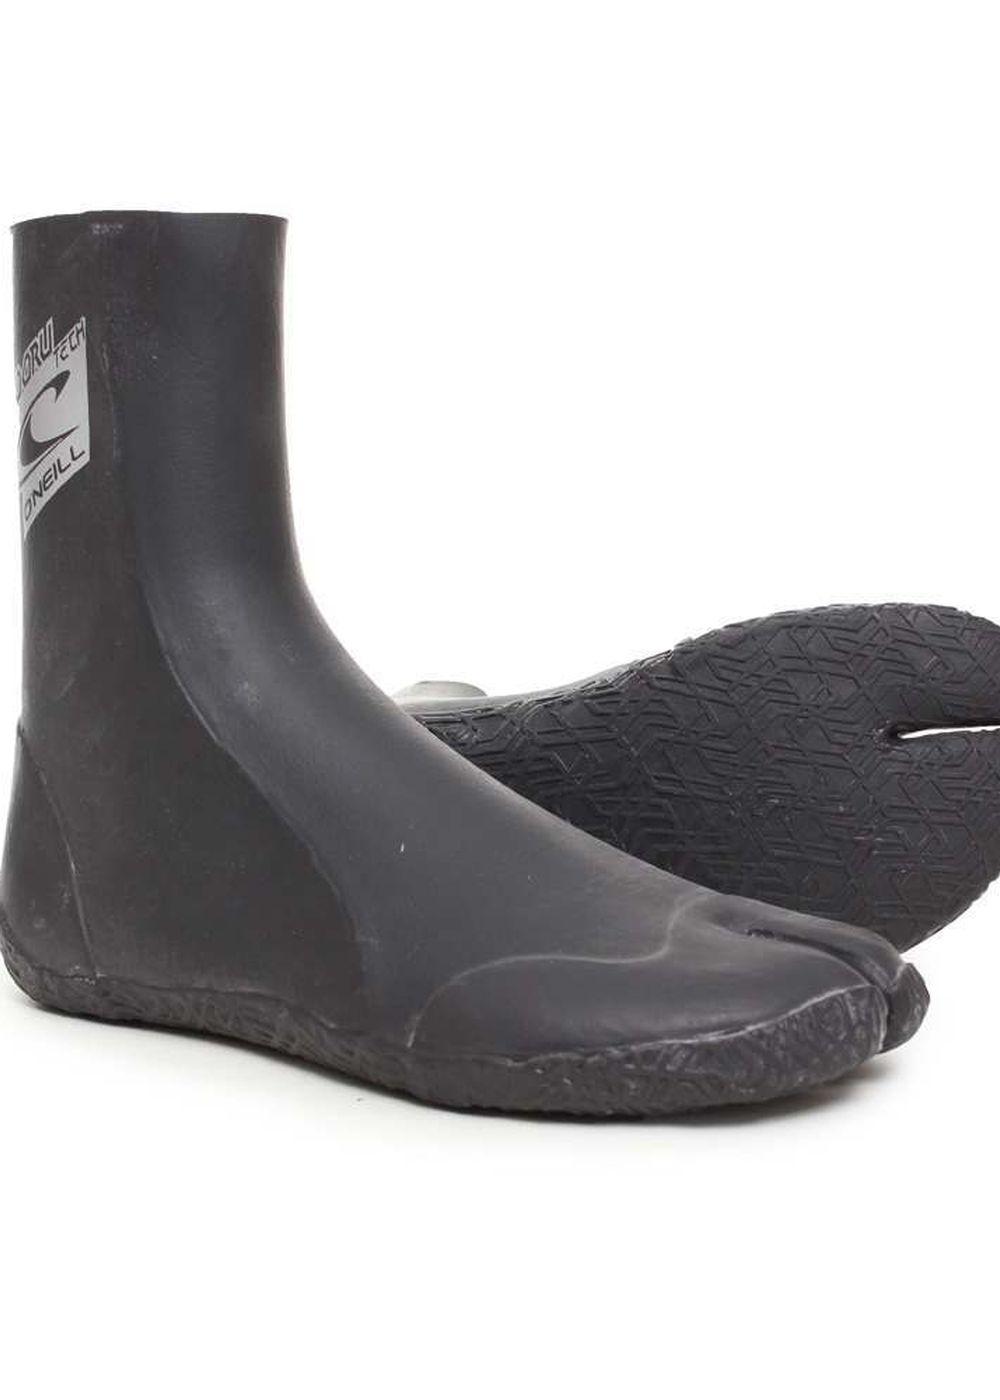 Oneill Gooru Tech 3mm St Wetsuit Boots Picture